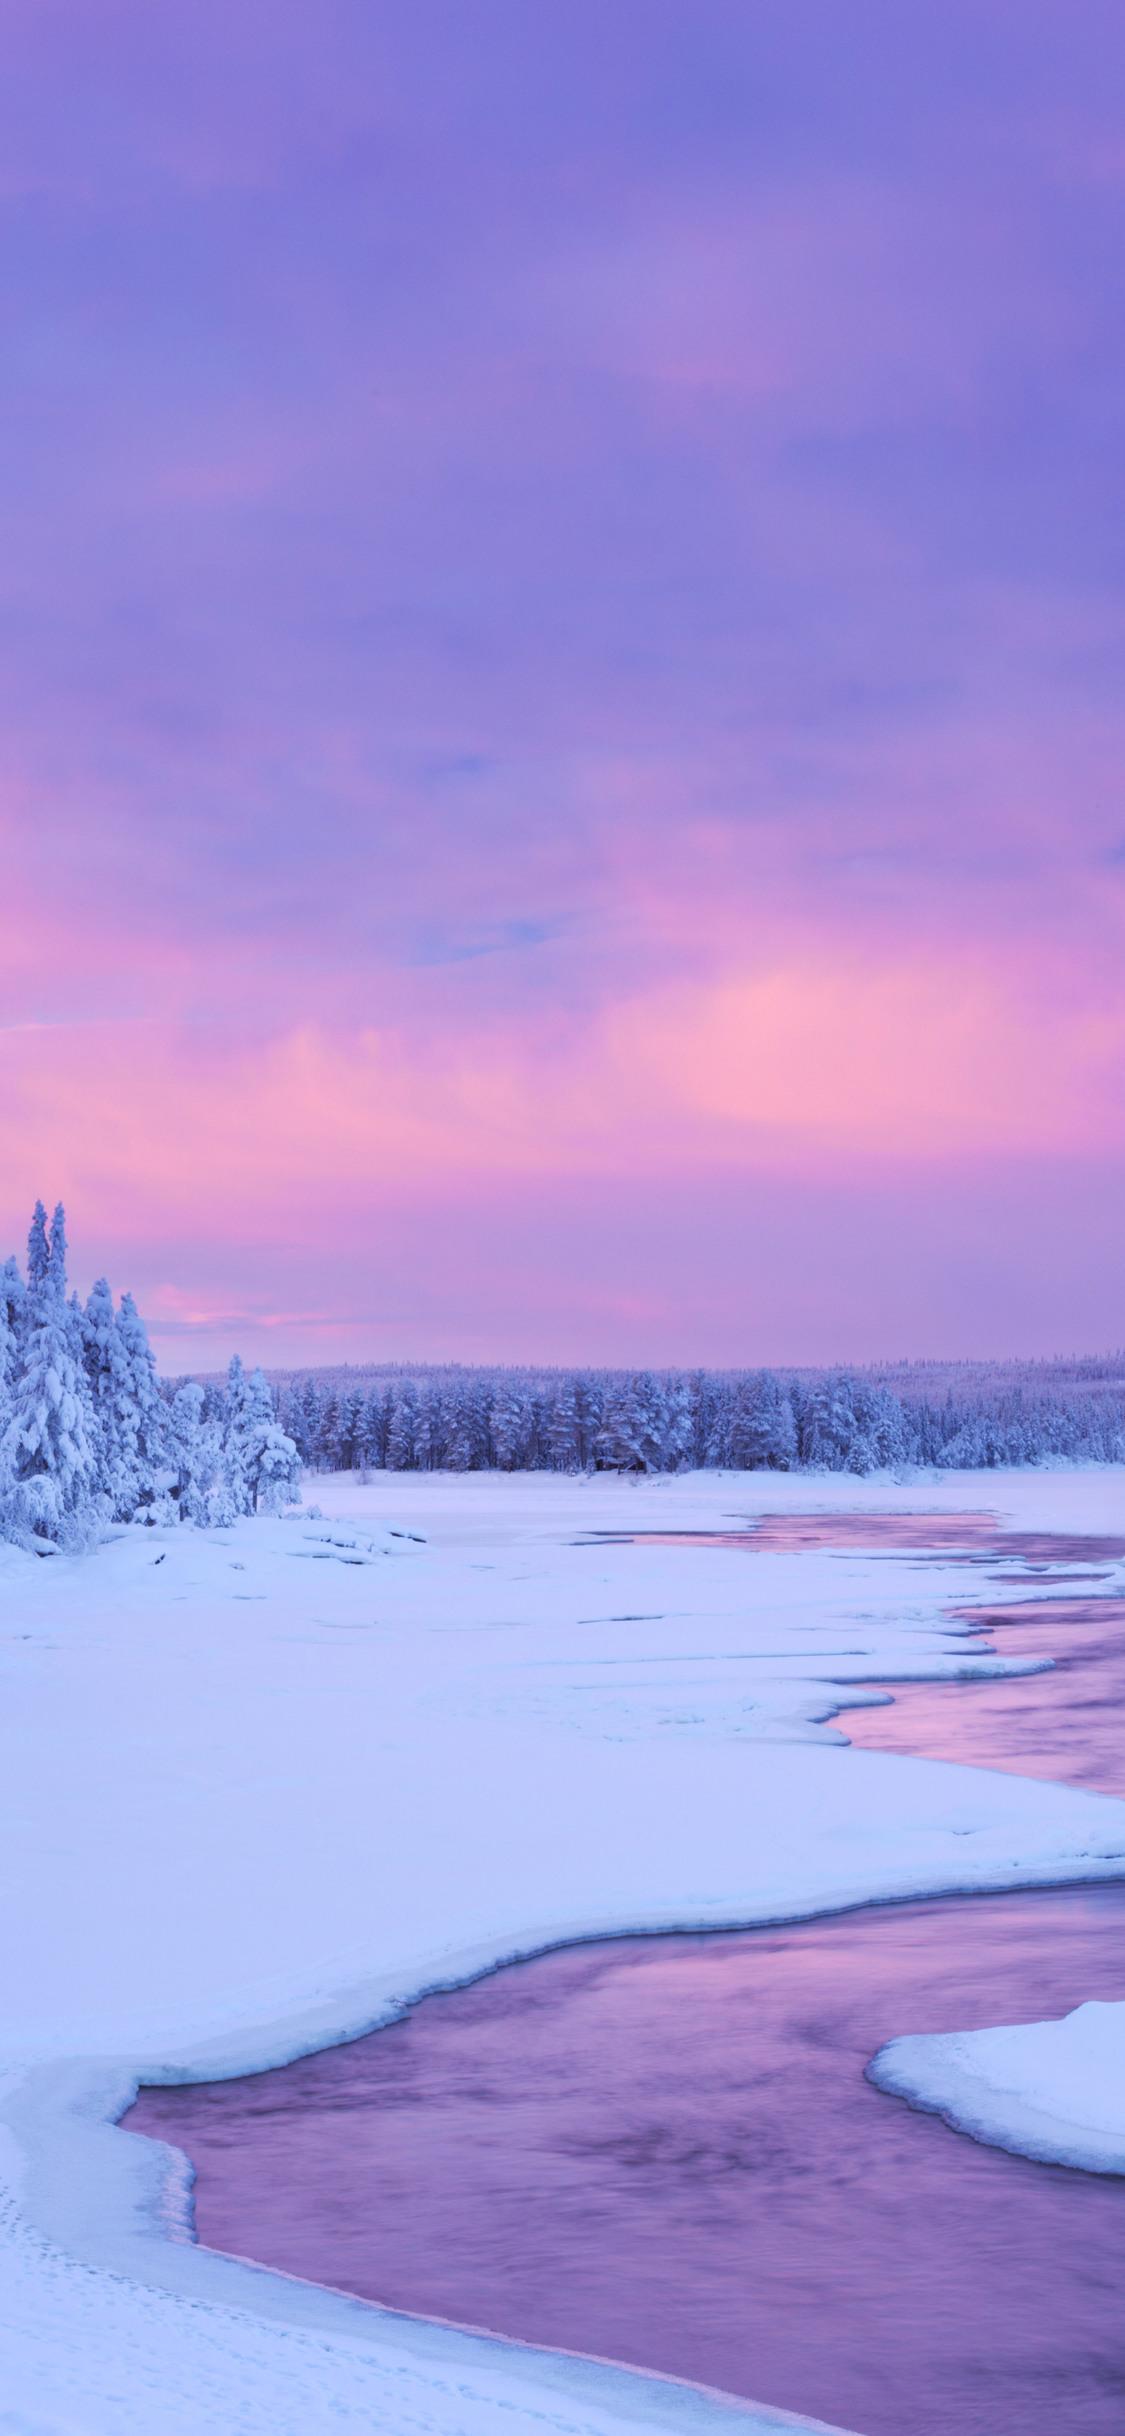 1125x2436 Winter 5k Iphone Xs Iphone 10 Iphone X Hd 4k Wallpapers